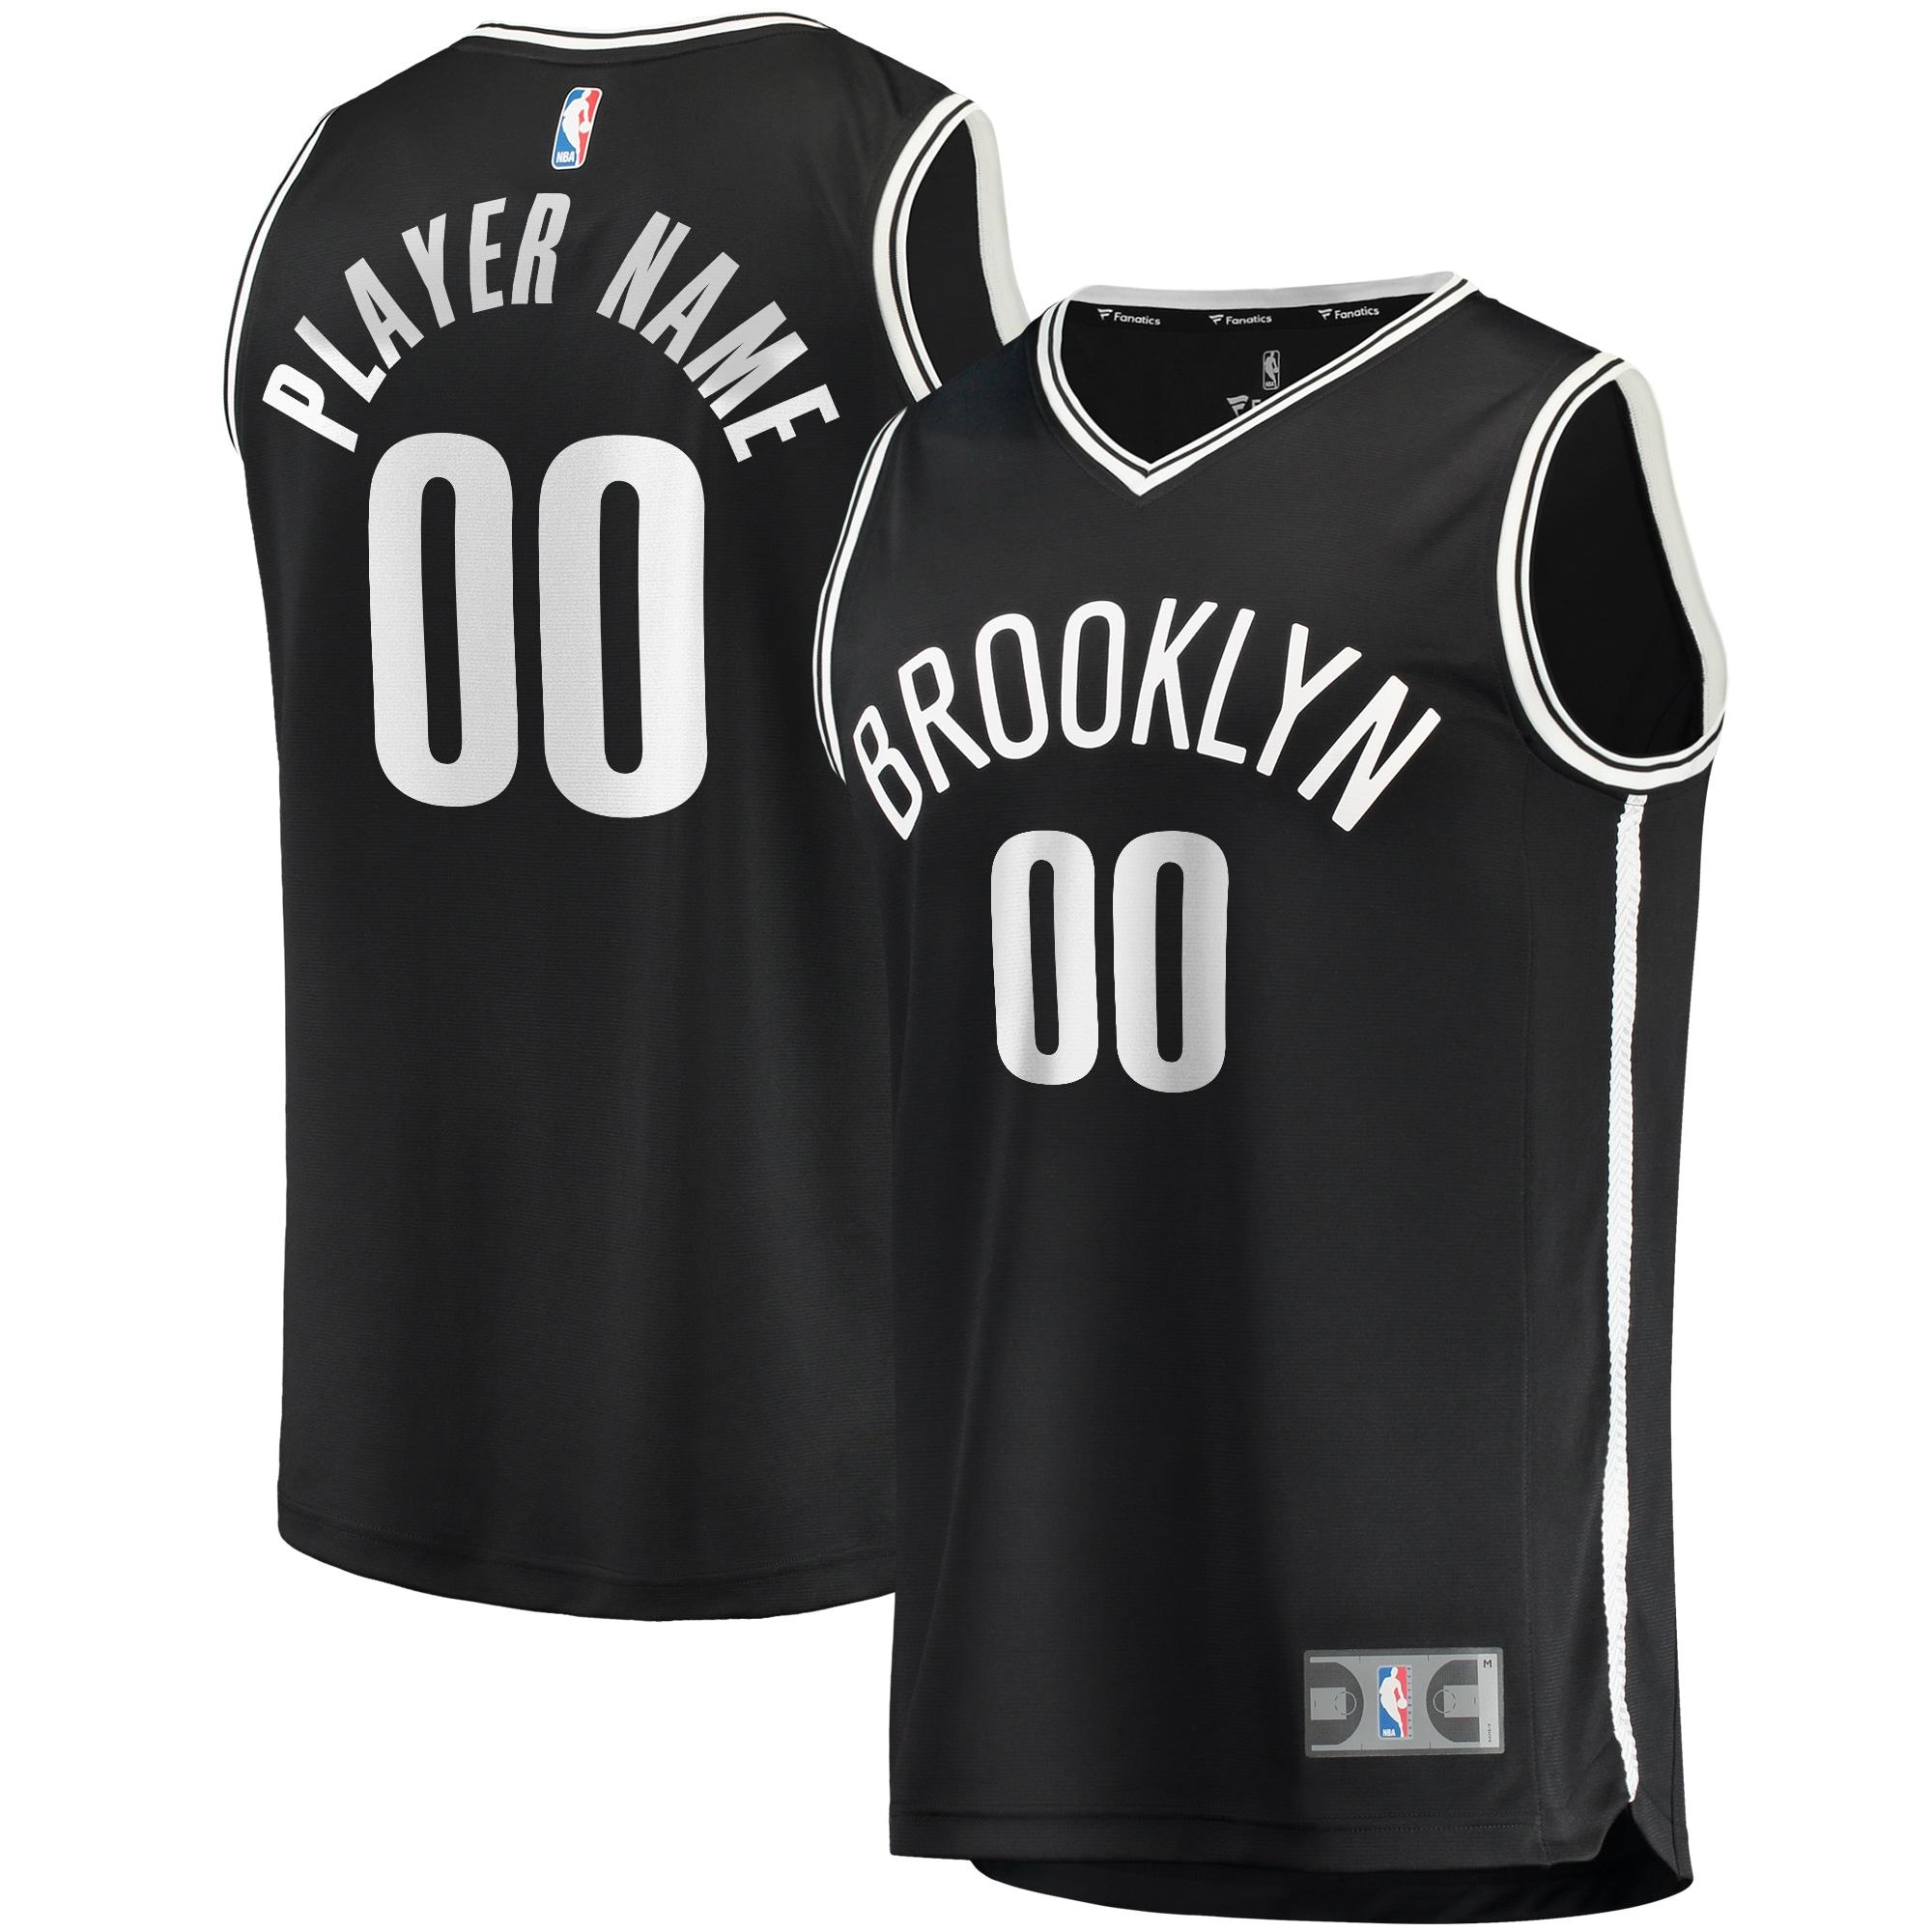 Brooklyn Nets Fanatics Branded Fast Break Custom Replica Jersey Black - Icon Edition